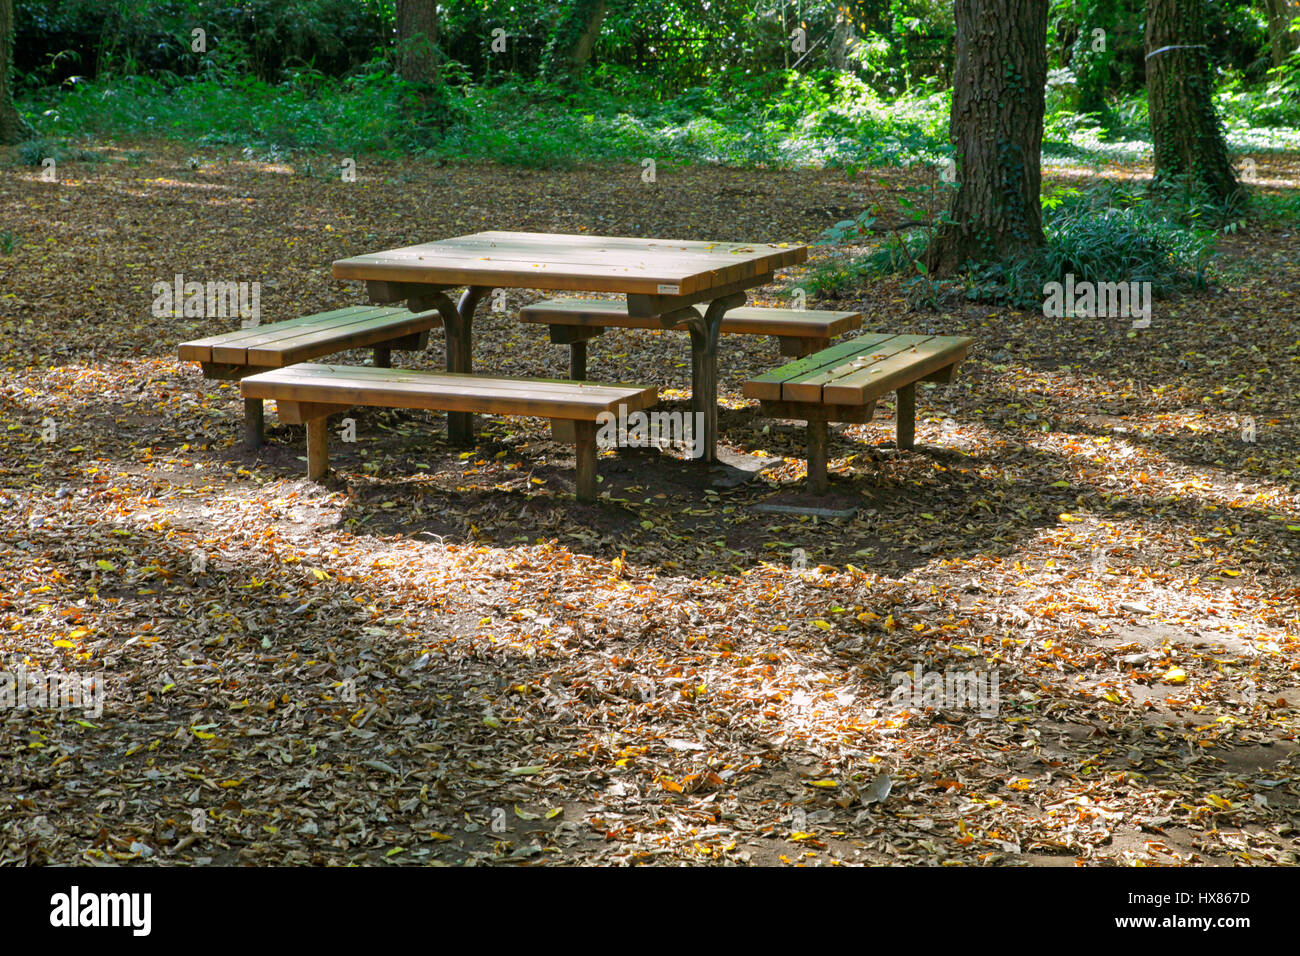 Tavolo Giardino Con Panche.Un Tavolo Con Panche In Boschi Di Jindai Giardino Botanico A Chofu